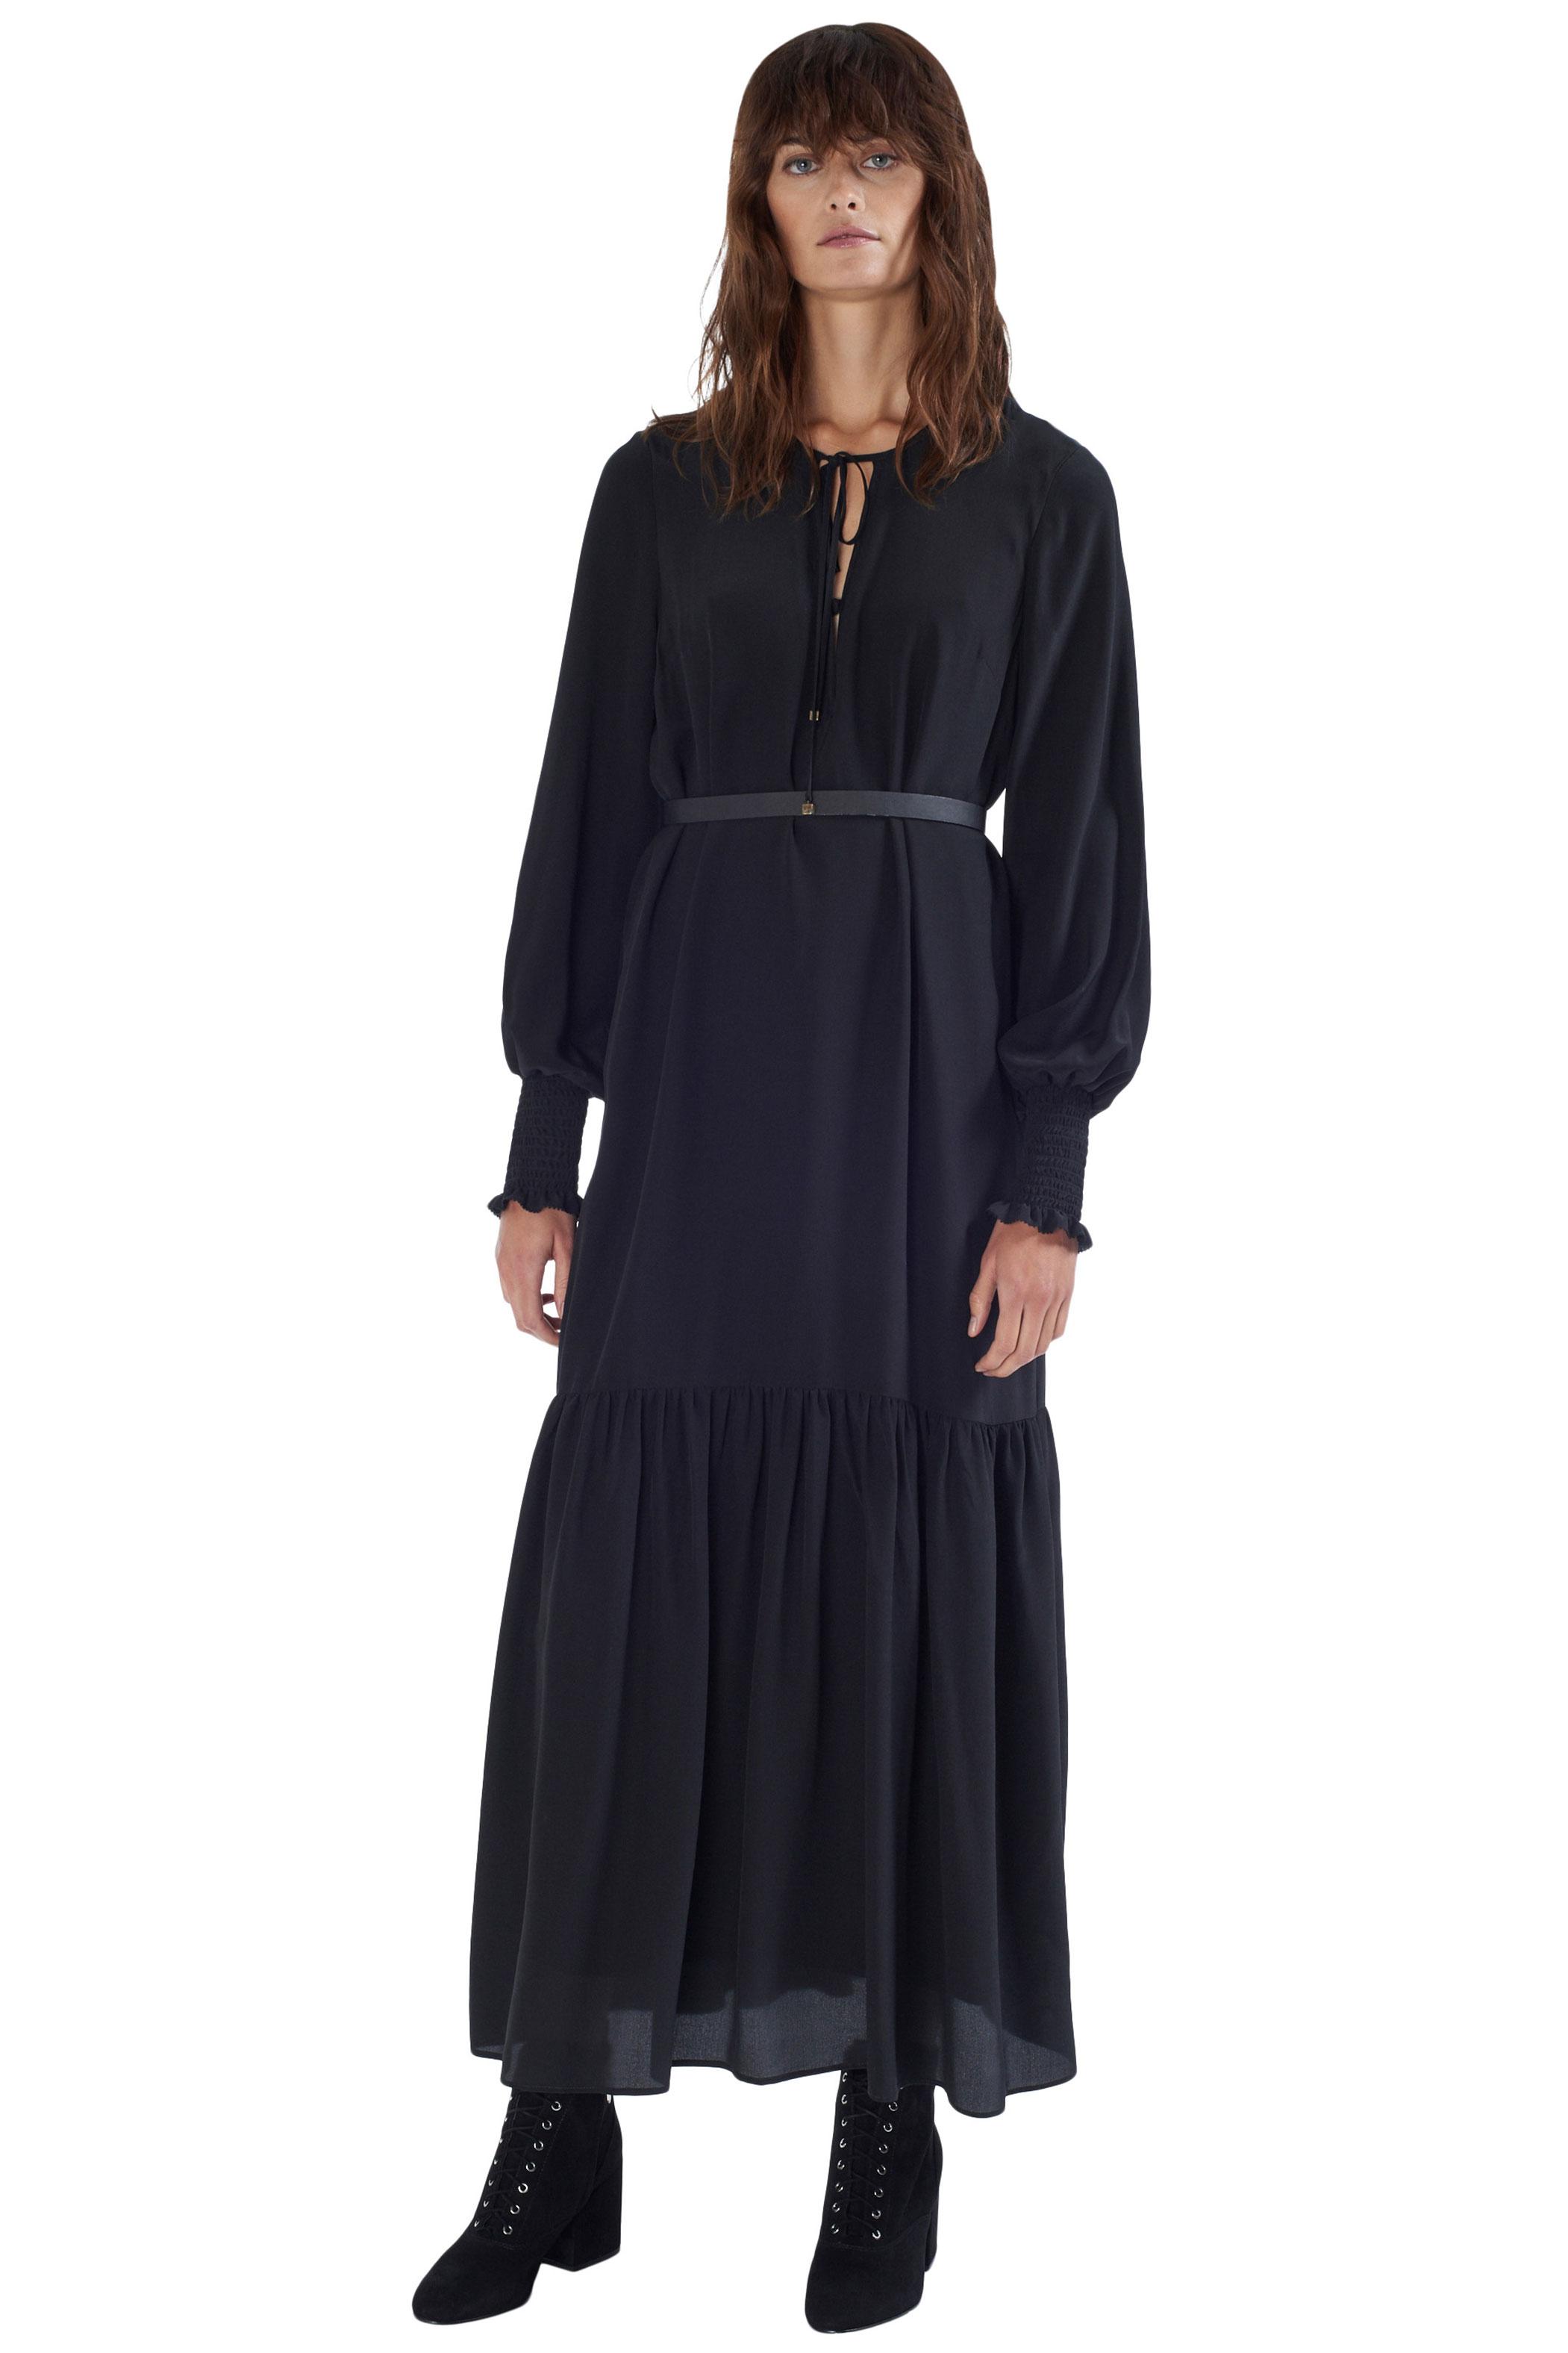 TIERRAS dress